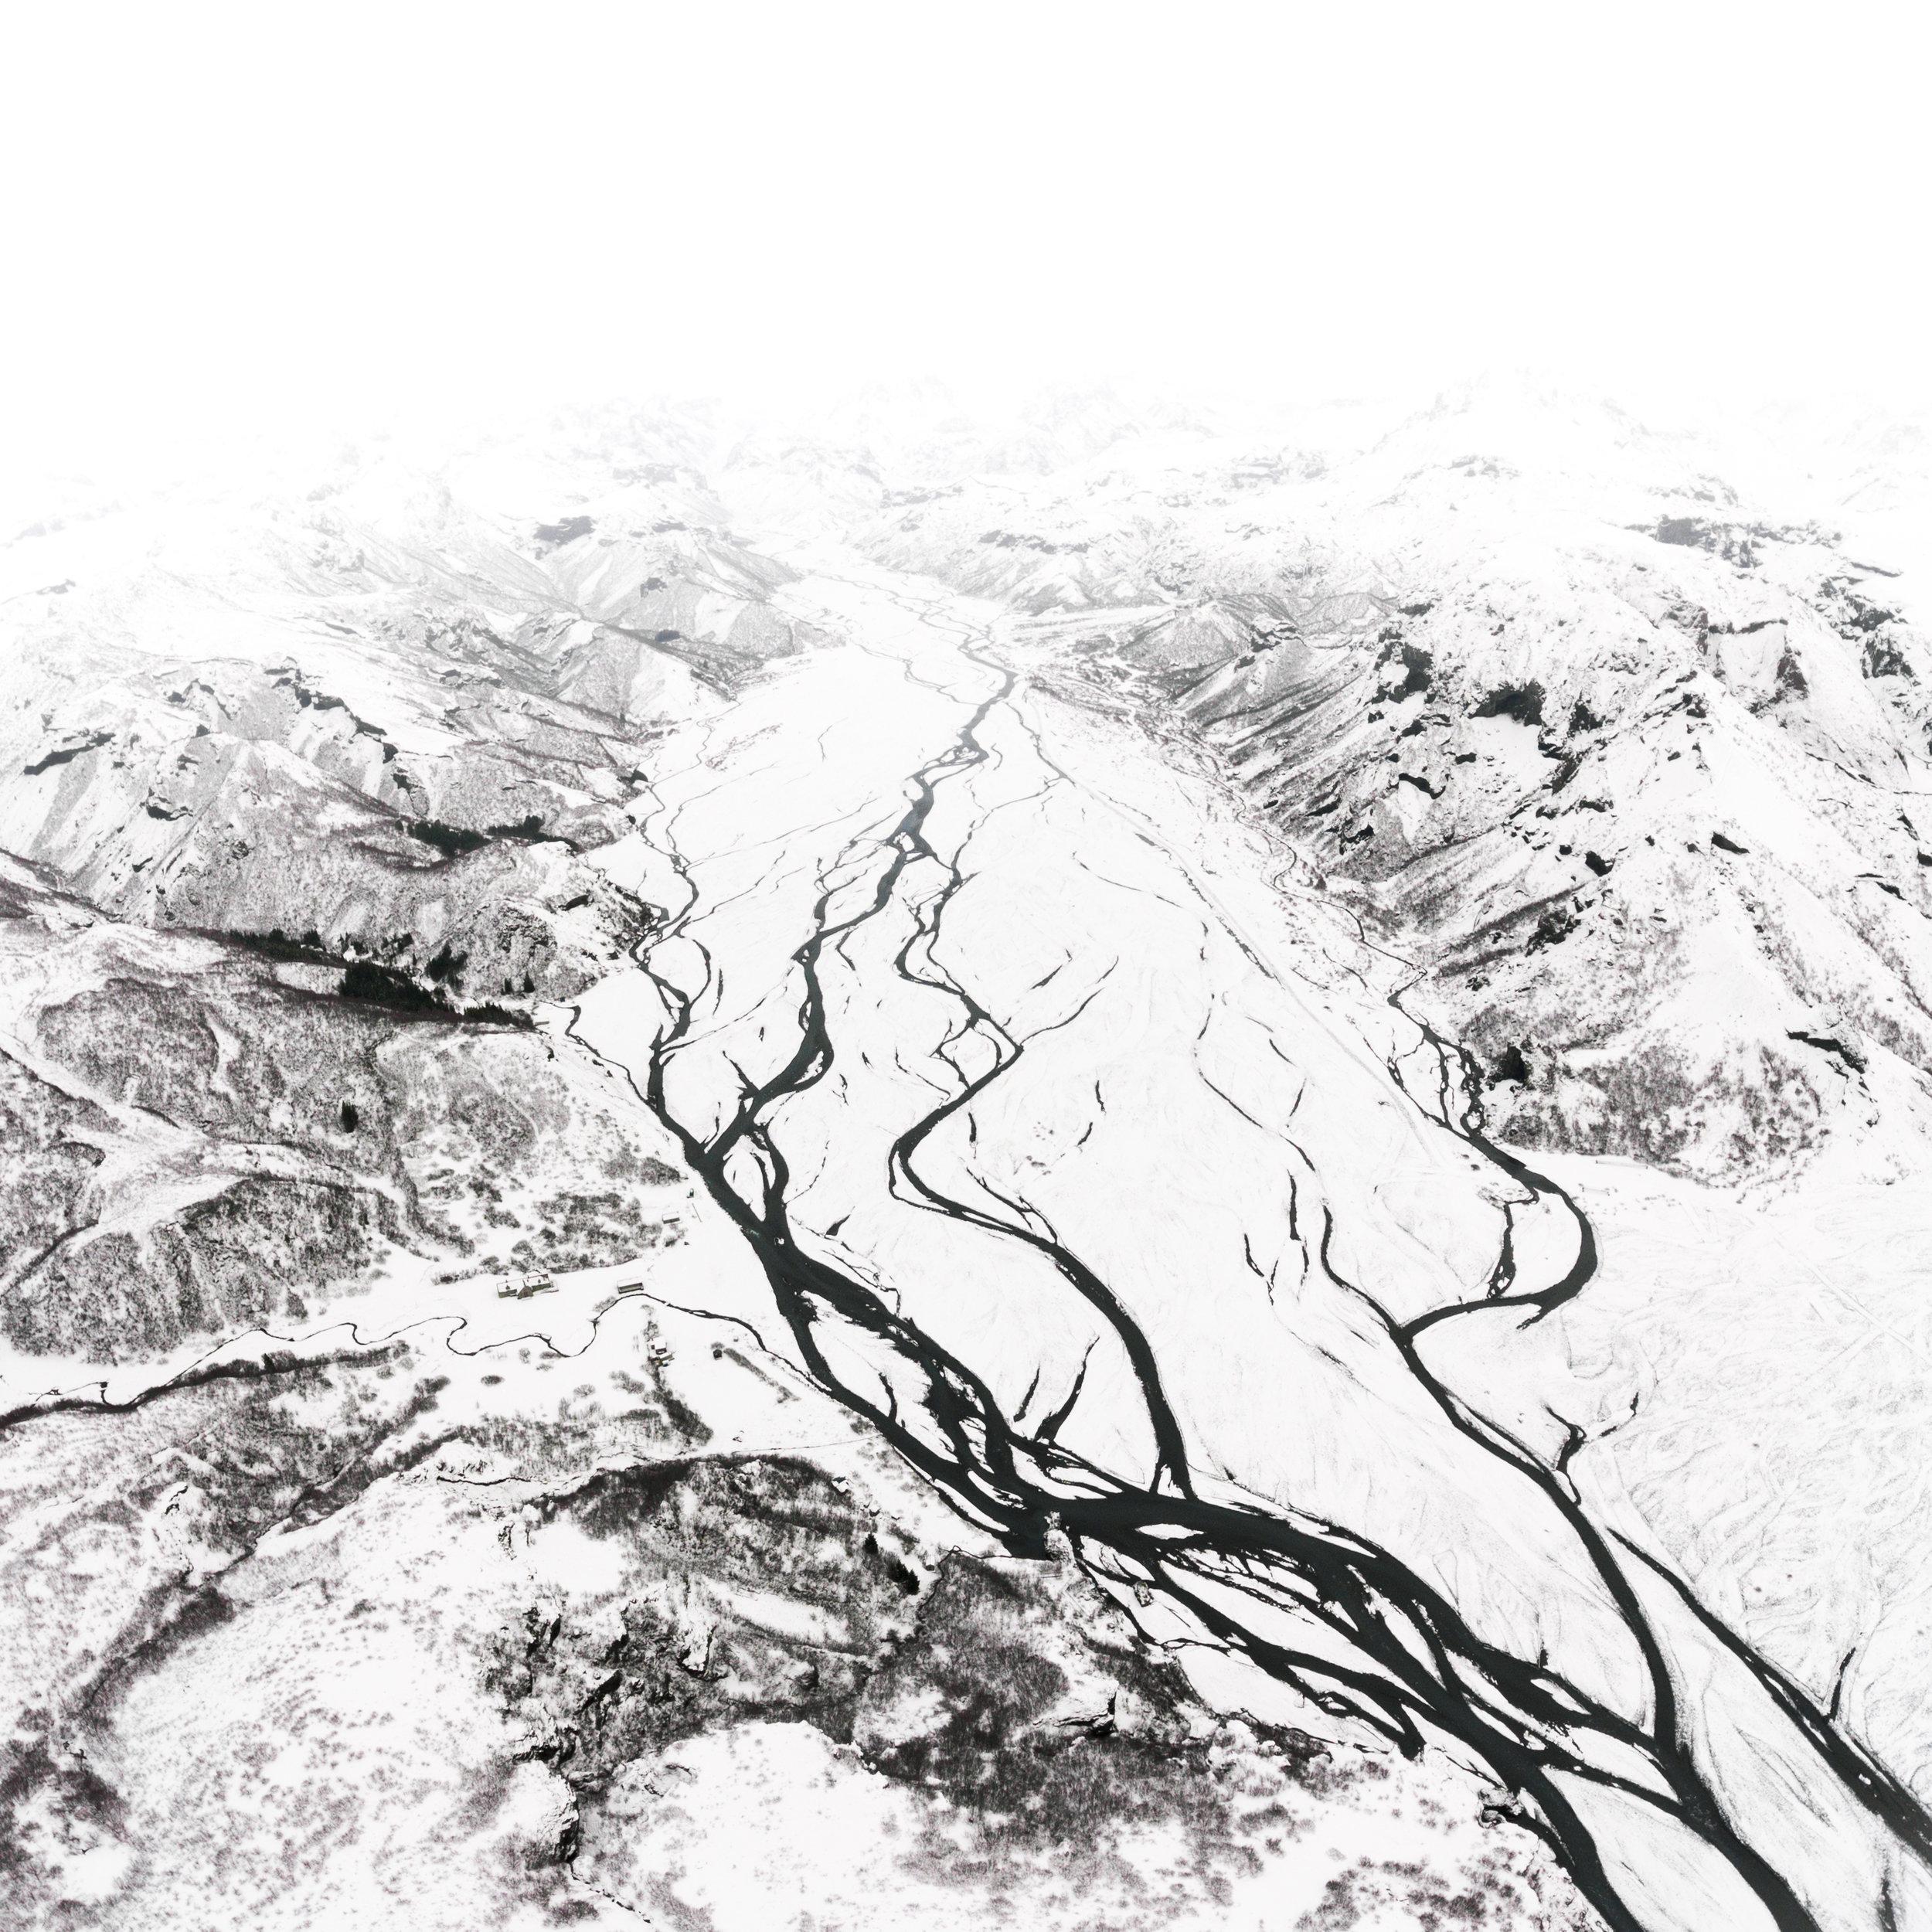 jermiah-schuster-iceland-340.jpg